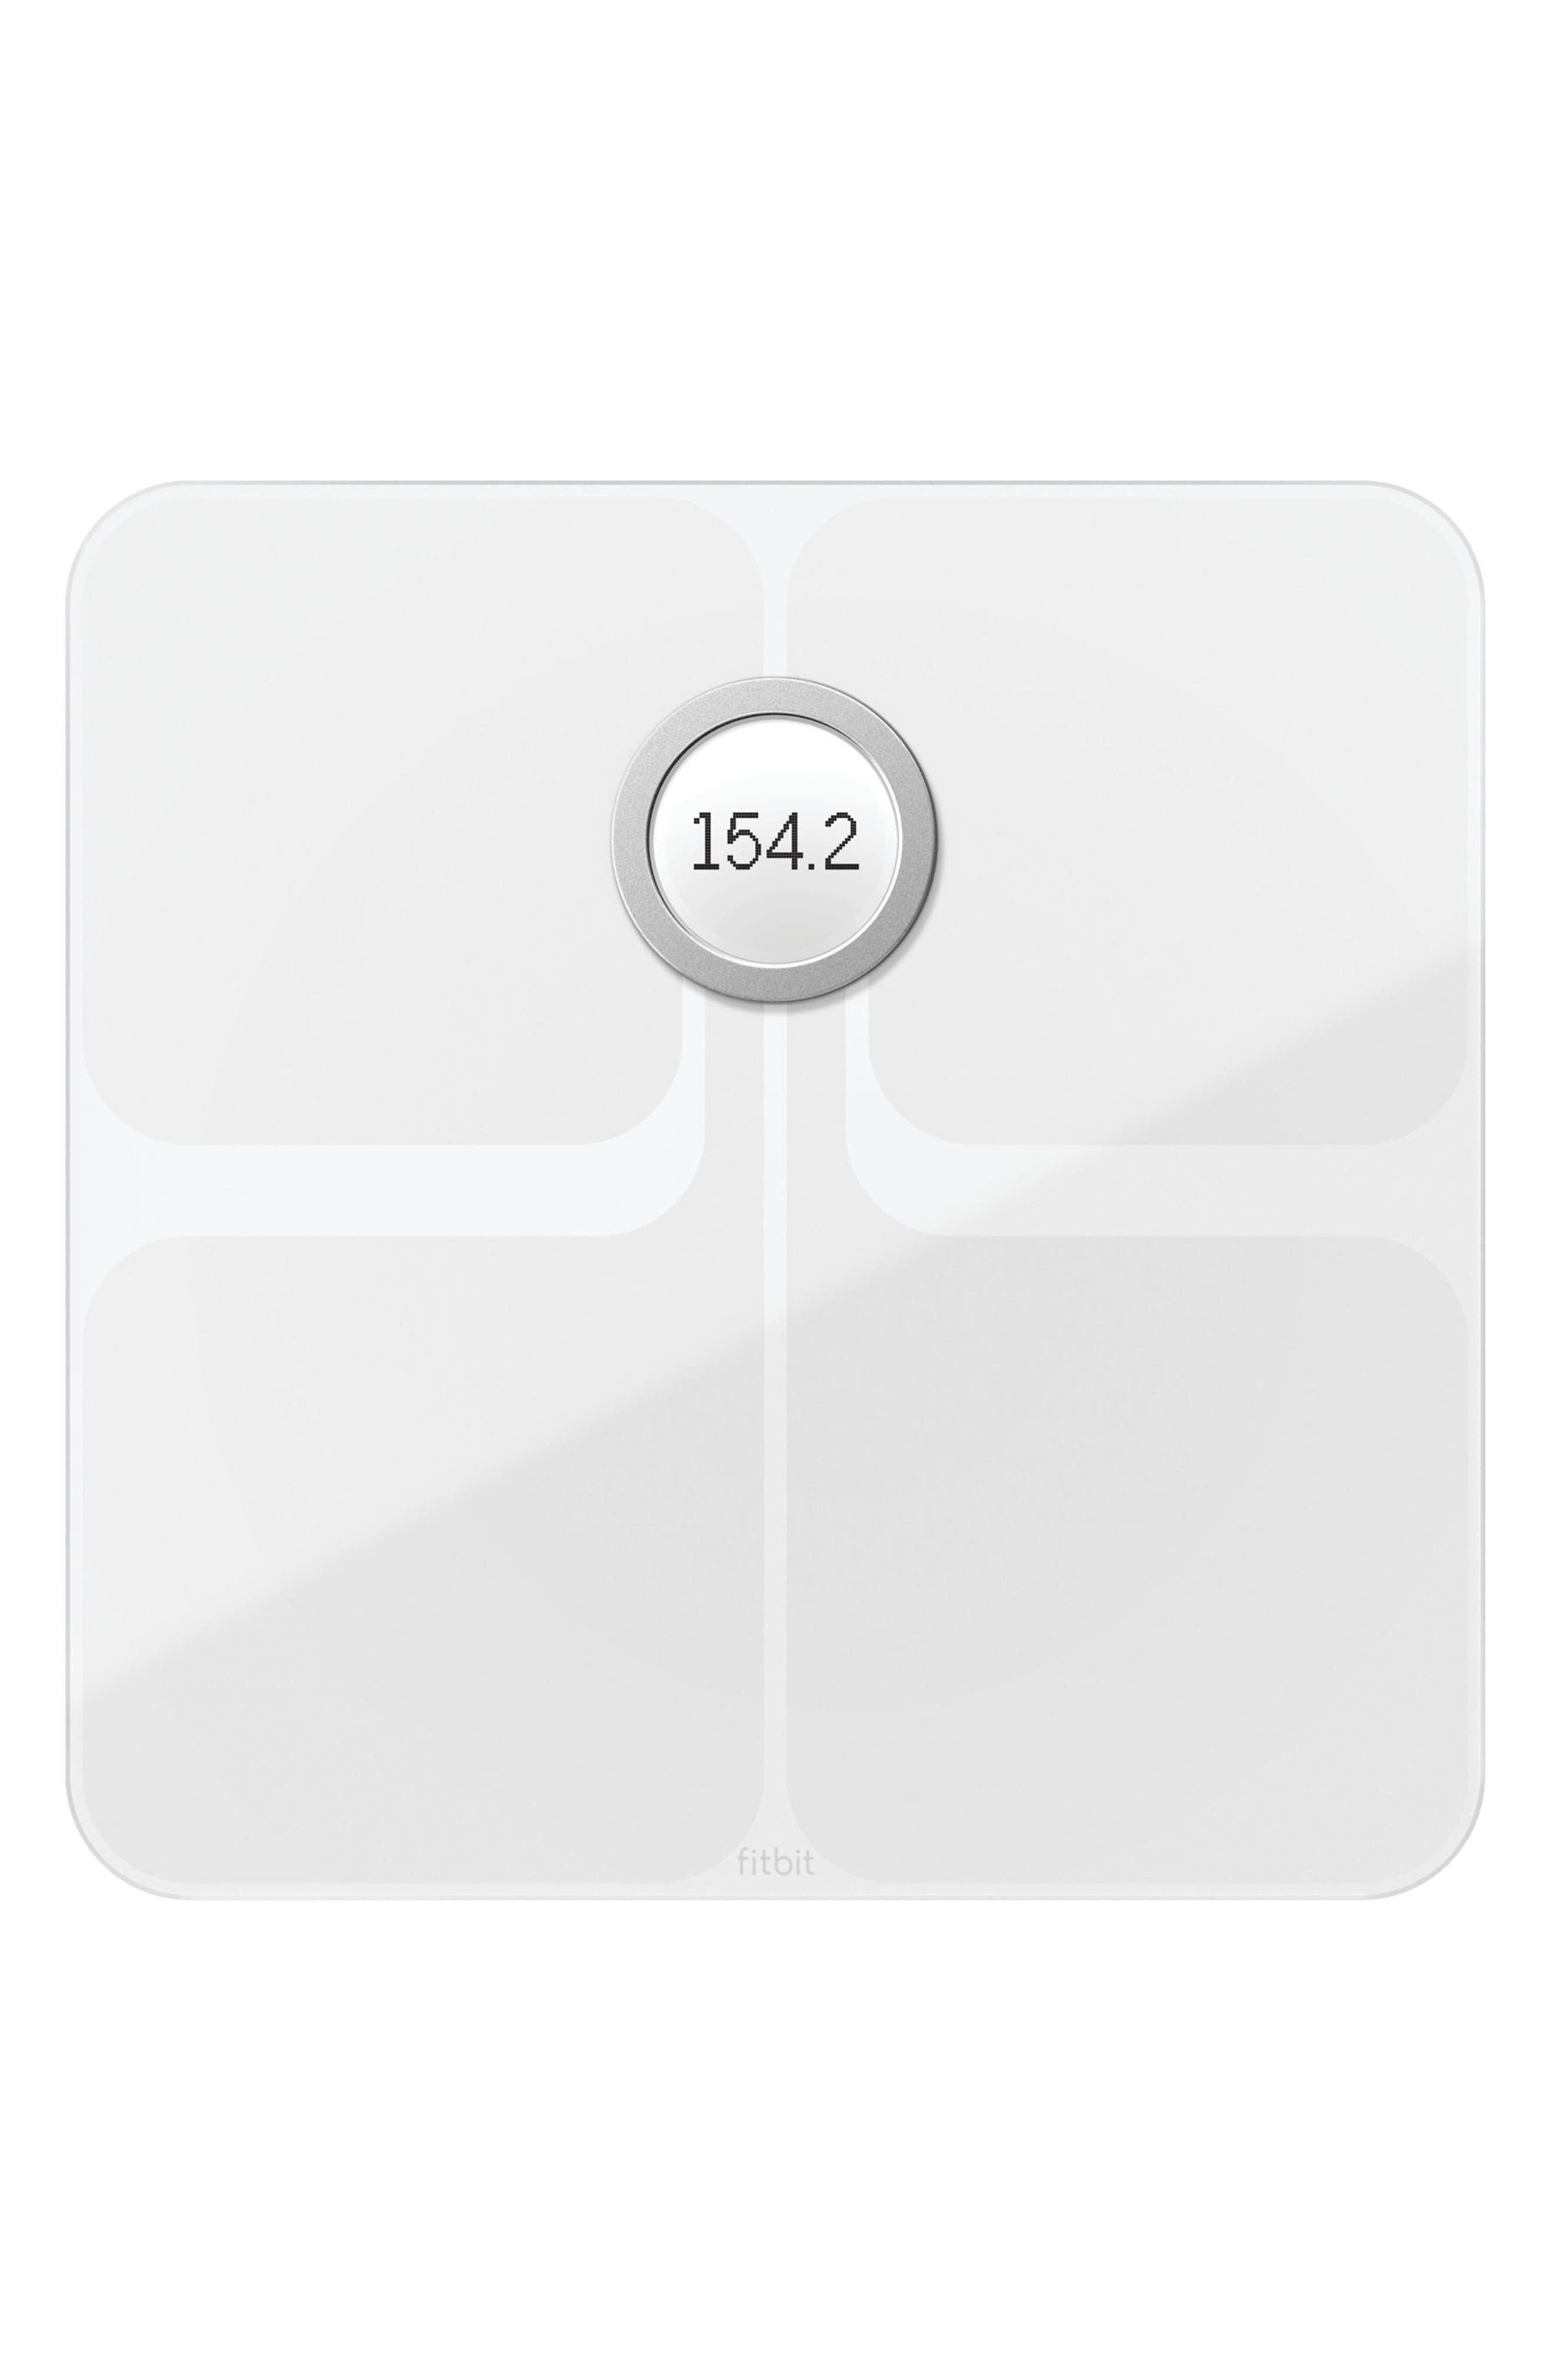 Fitbit Aria 2 Wireless Smart Scale